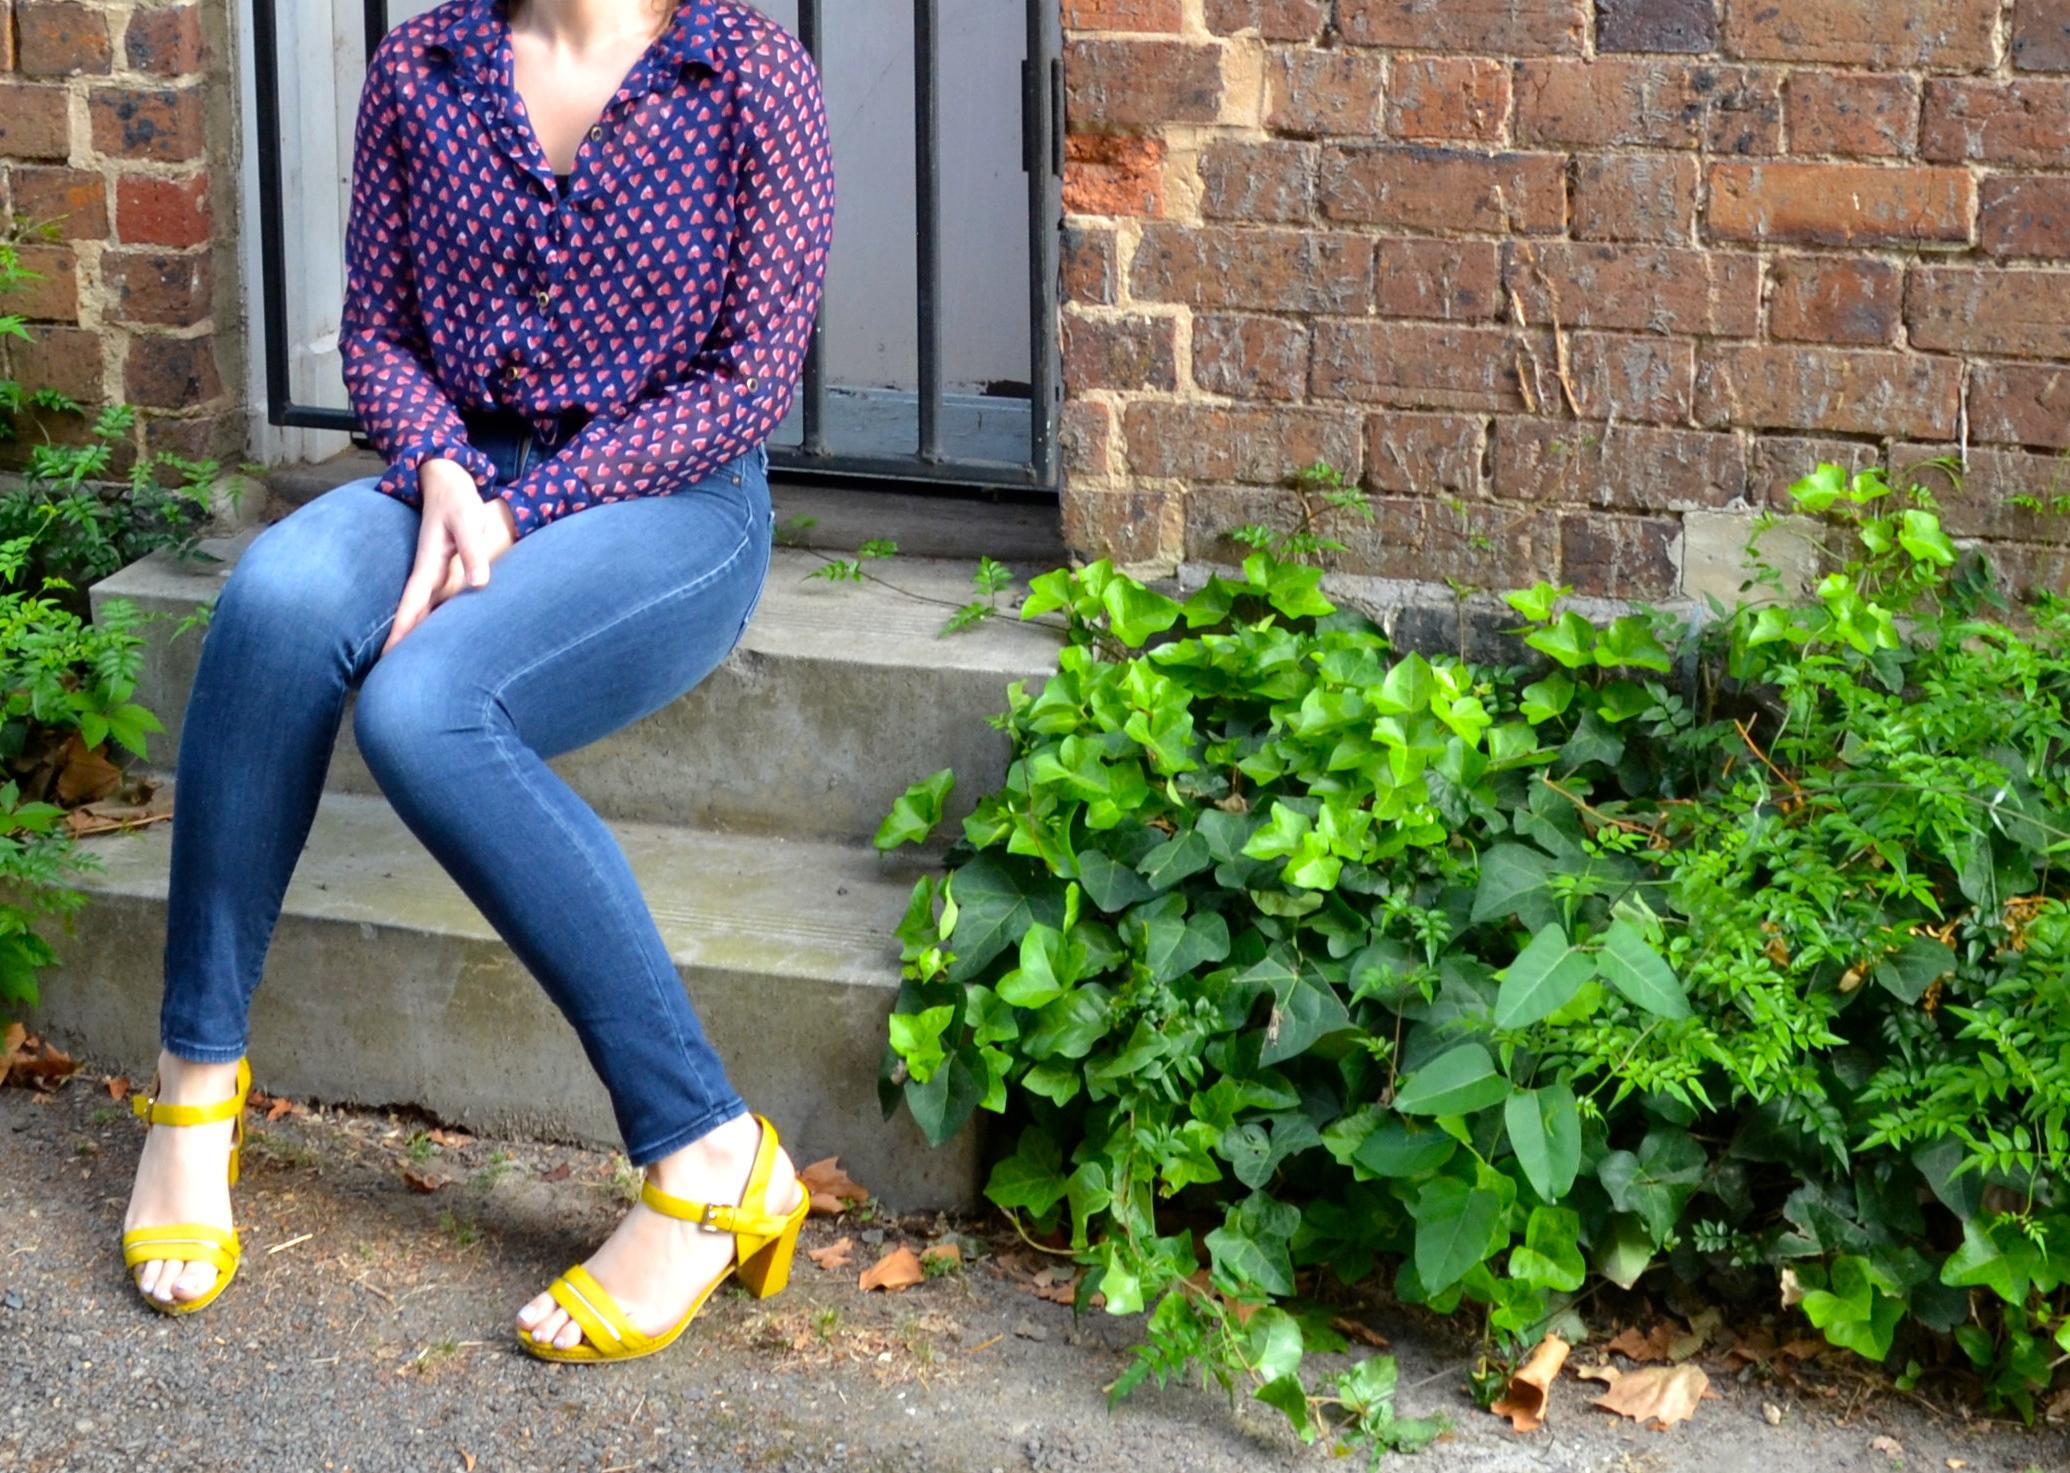 yellow-heels-brick-step-jeans-purple-heart-blouse